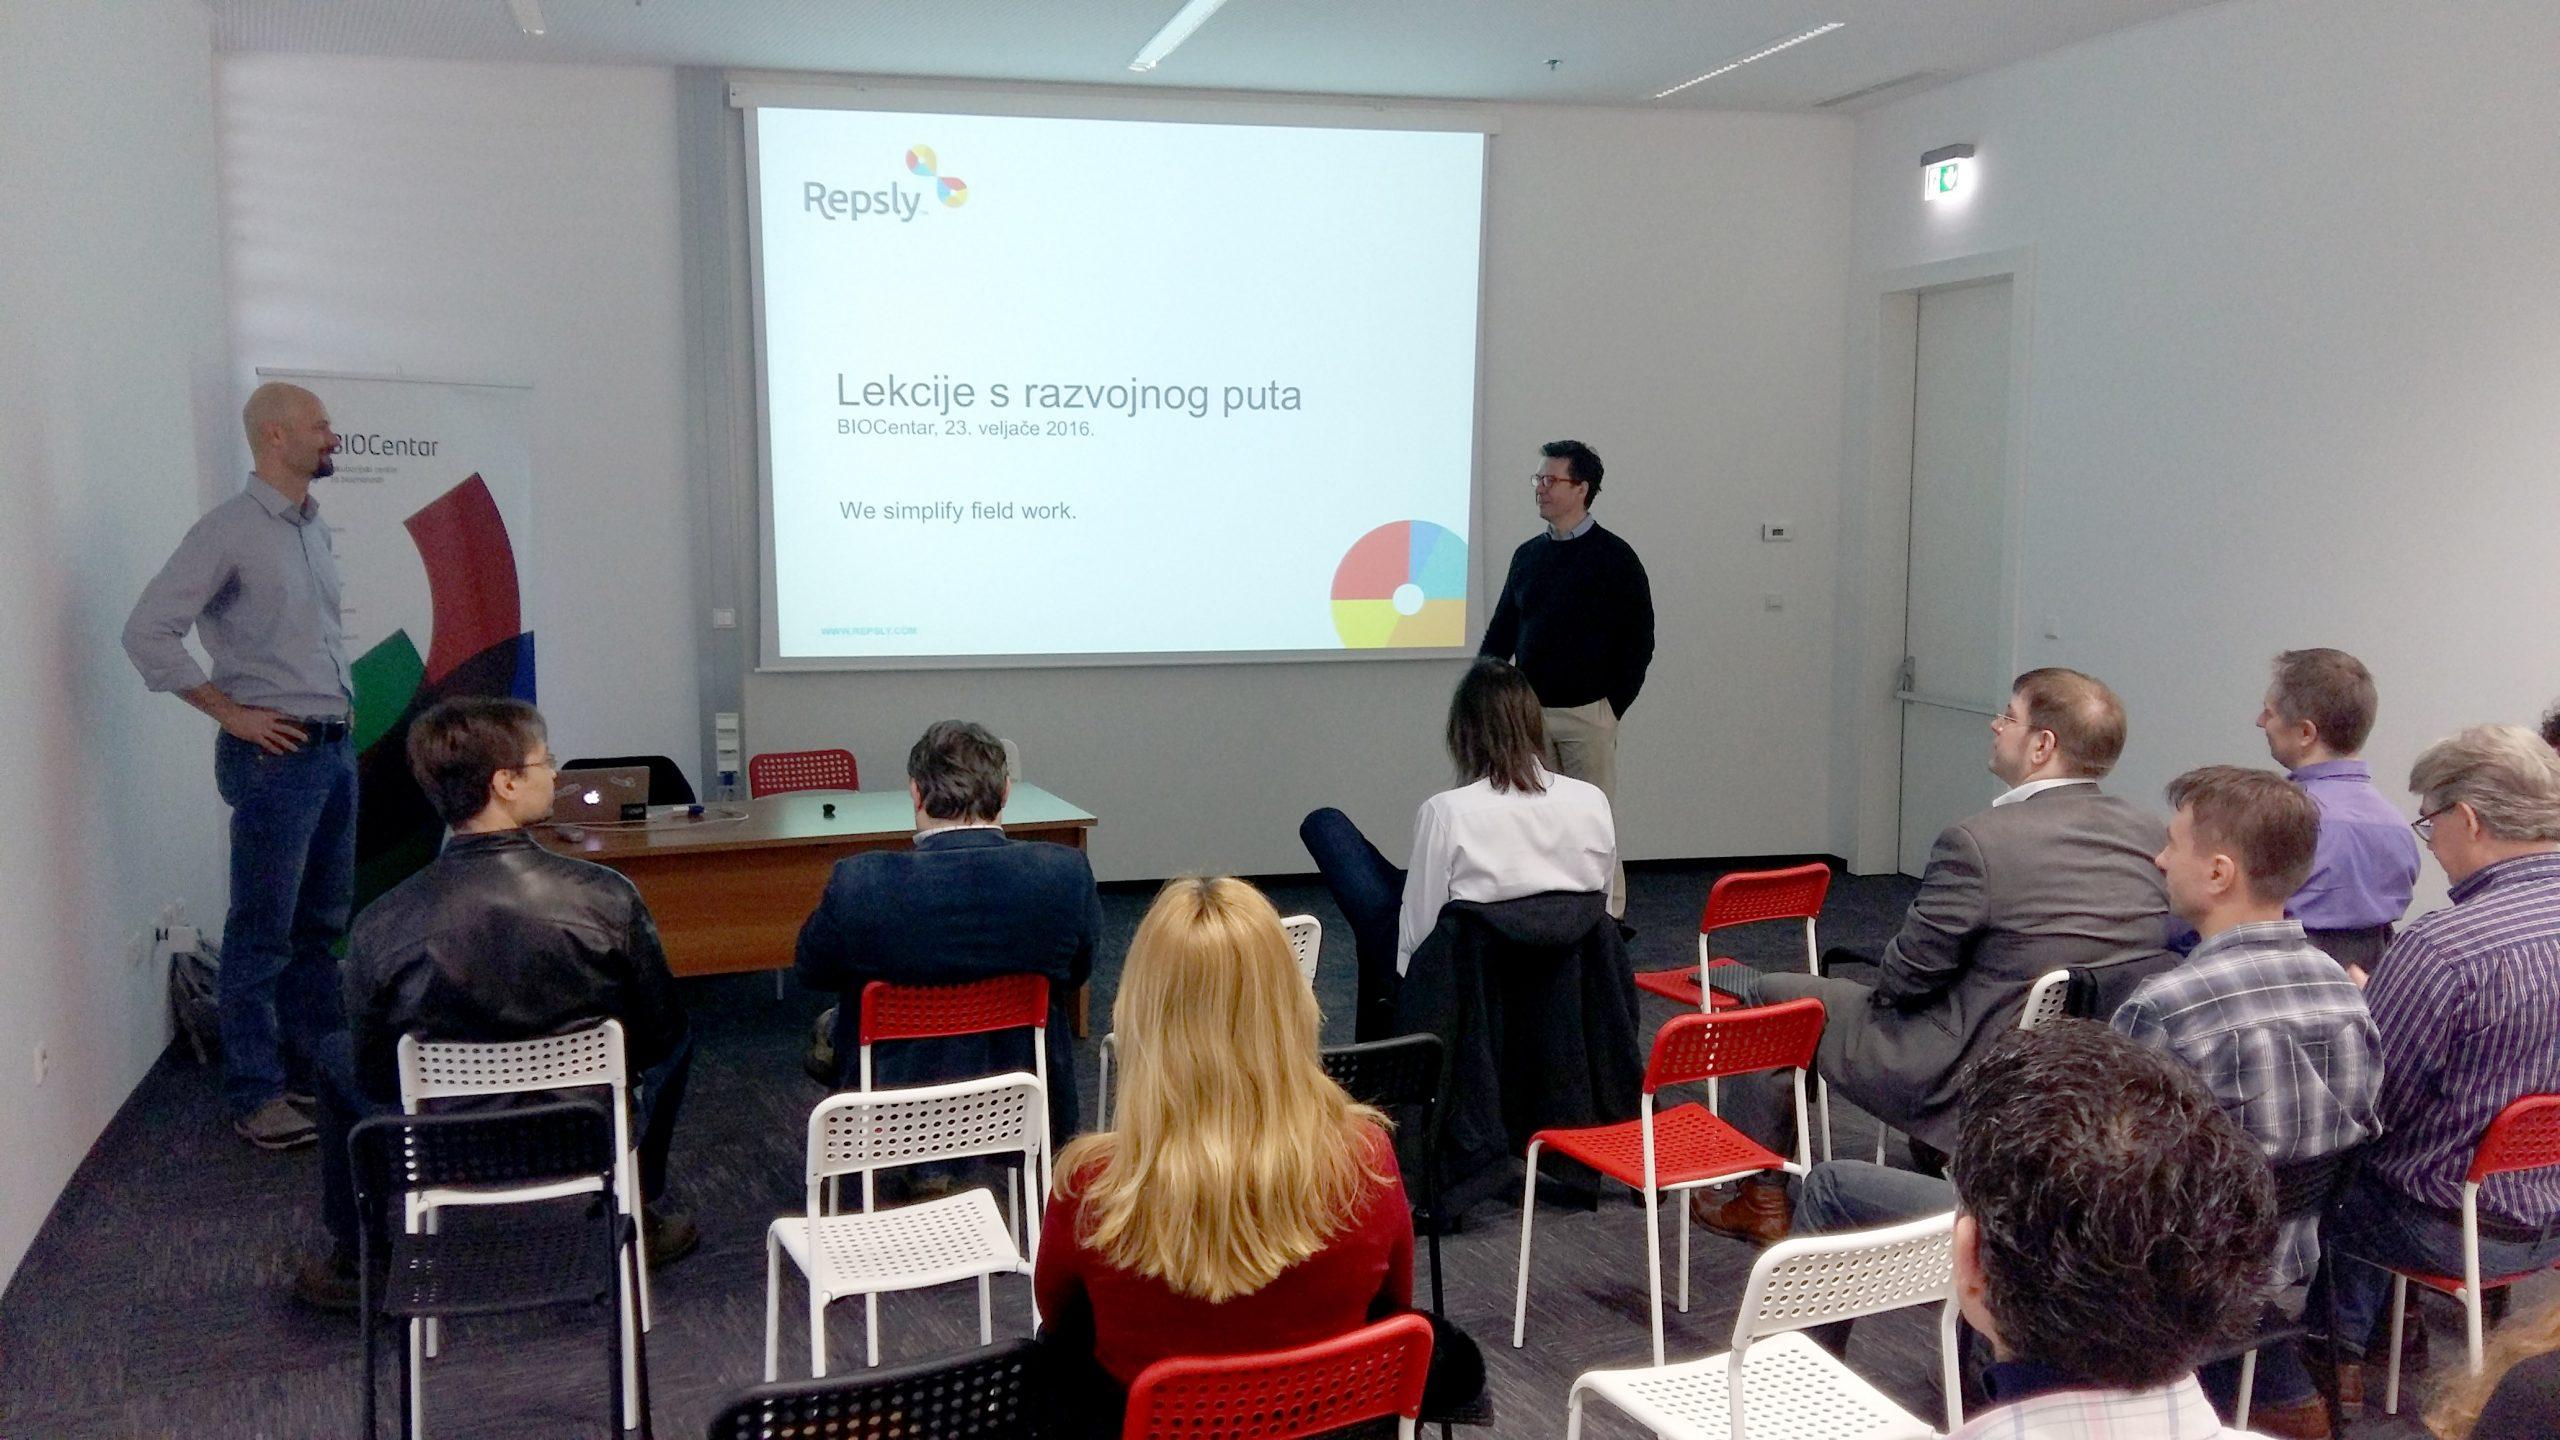 160223 Marko Kovac BIOCentar Lecture Scaled